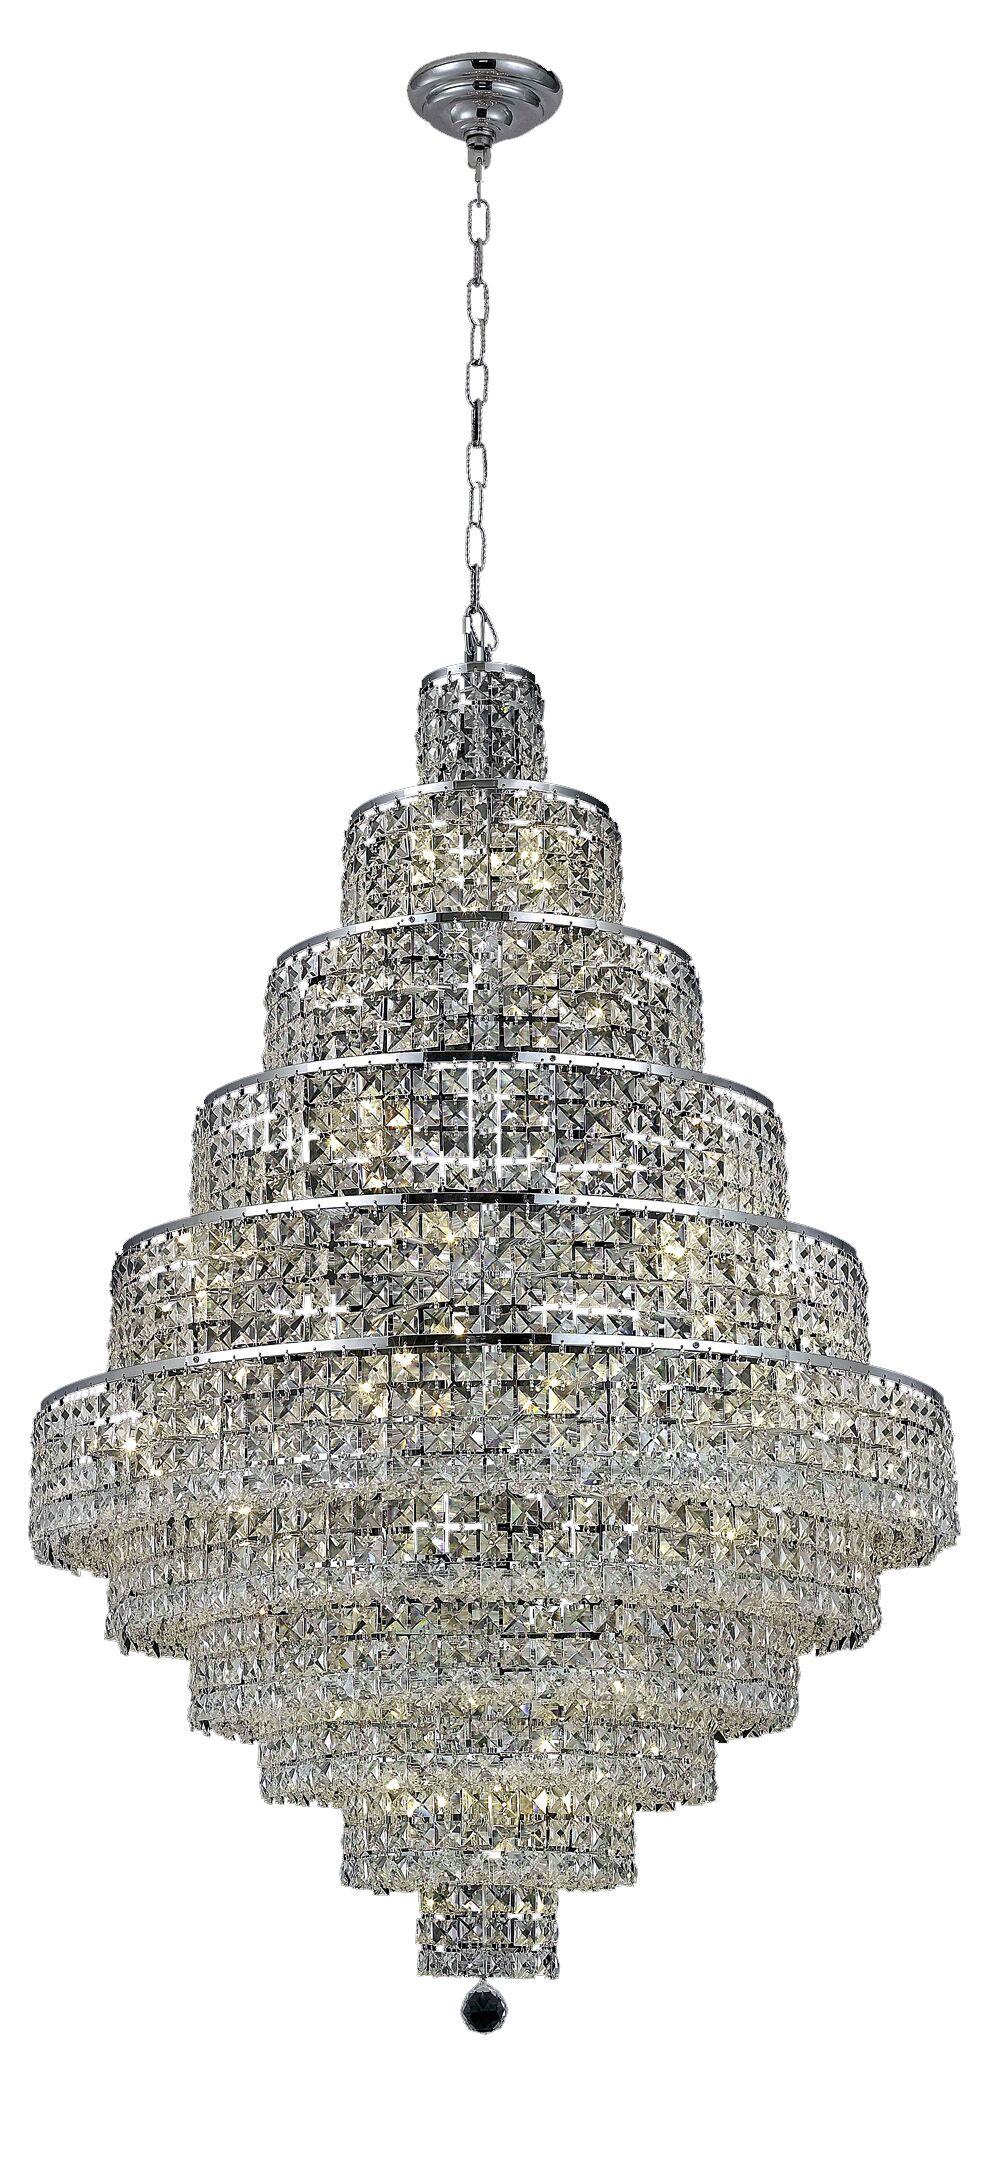 Bratton Contemporary 30-Light Chandelier Crystal Color / Crystal Trim: Golden Teak (Smoky) / Royal Cut